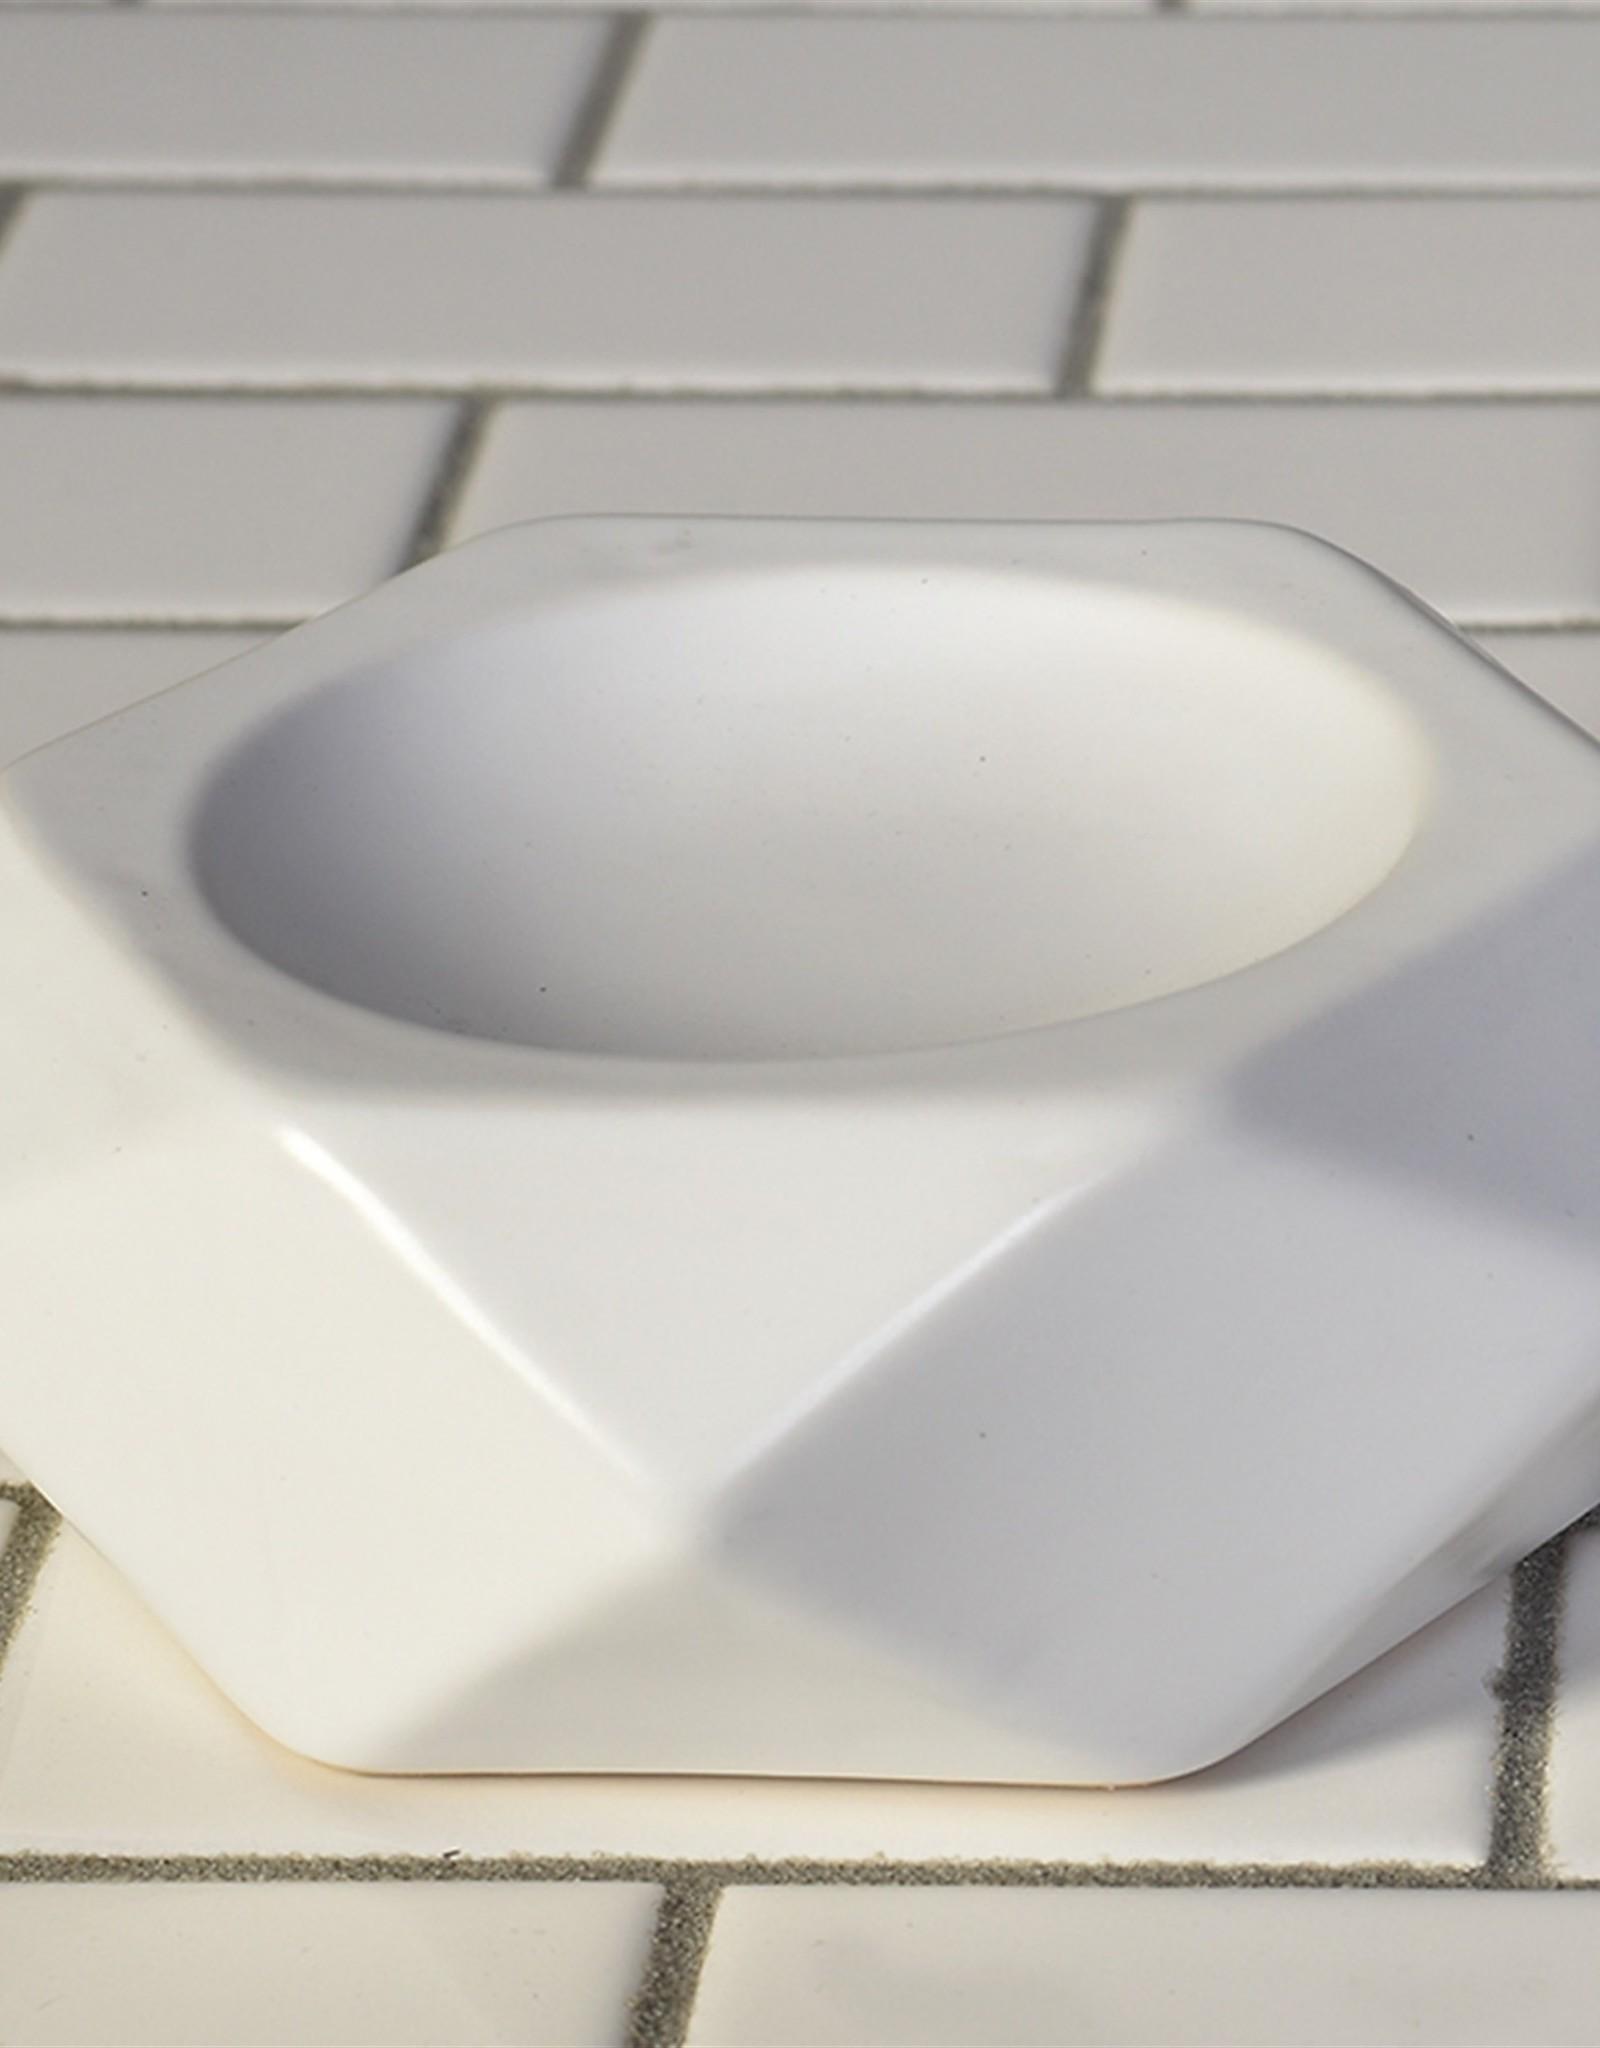 Faceted White Ceramic Soap Dish